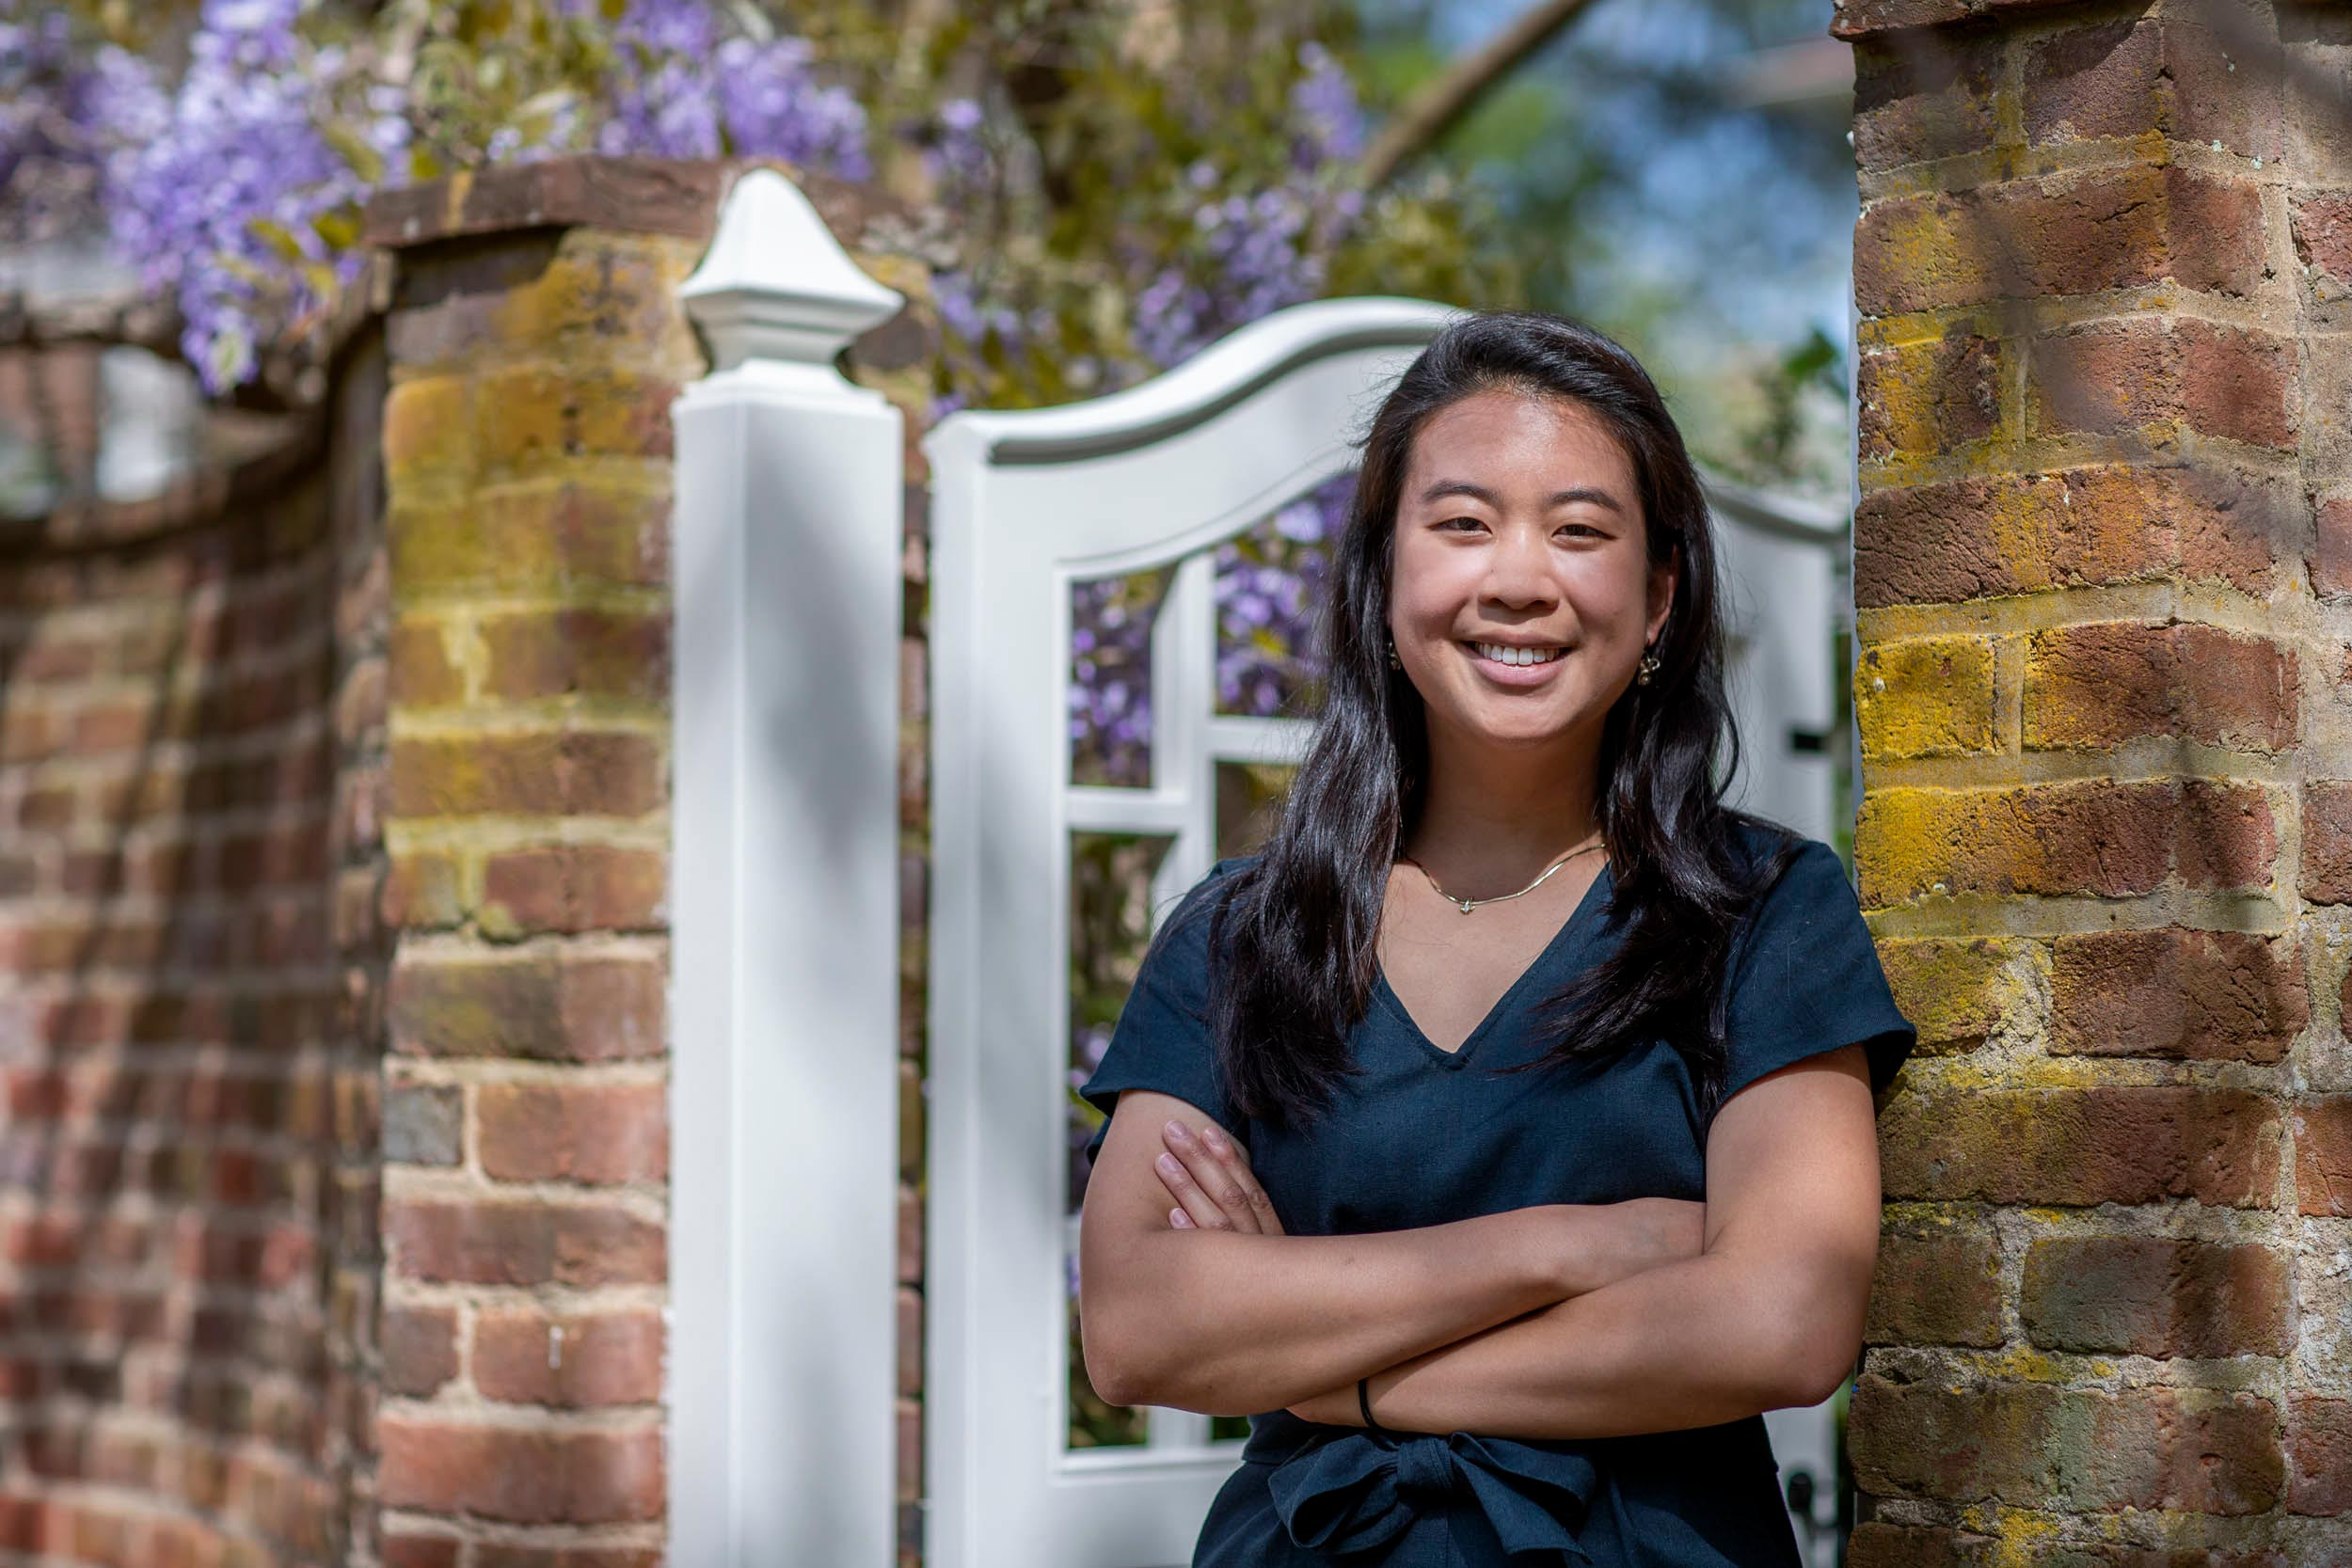 Class of 2019: As a 'CODA,' Kim Built Bridges for UVA's Deaf Community